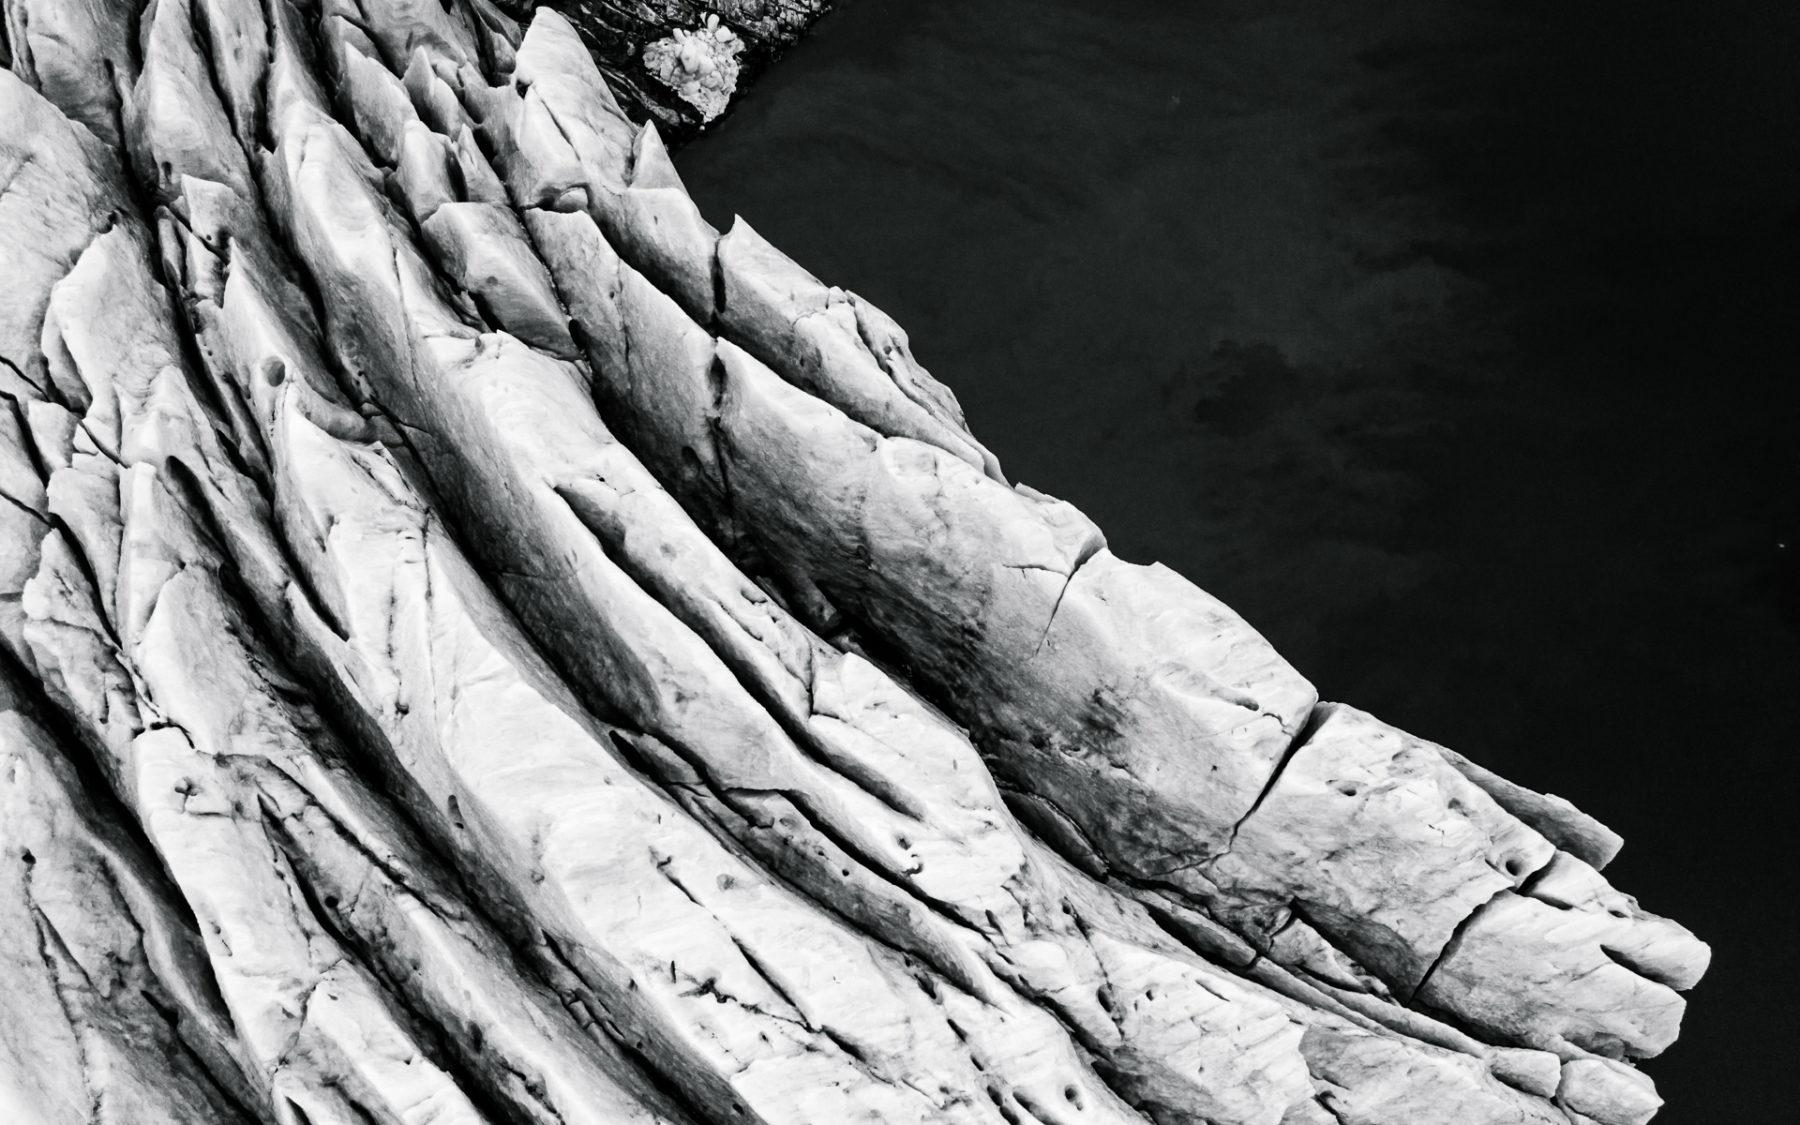 nls 2001 norway iceland portraits of glaciers 09